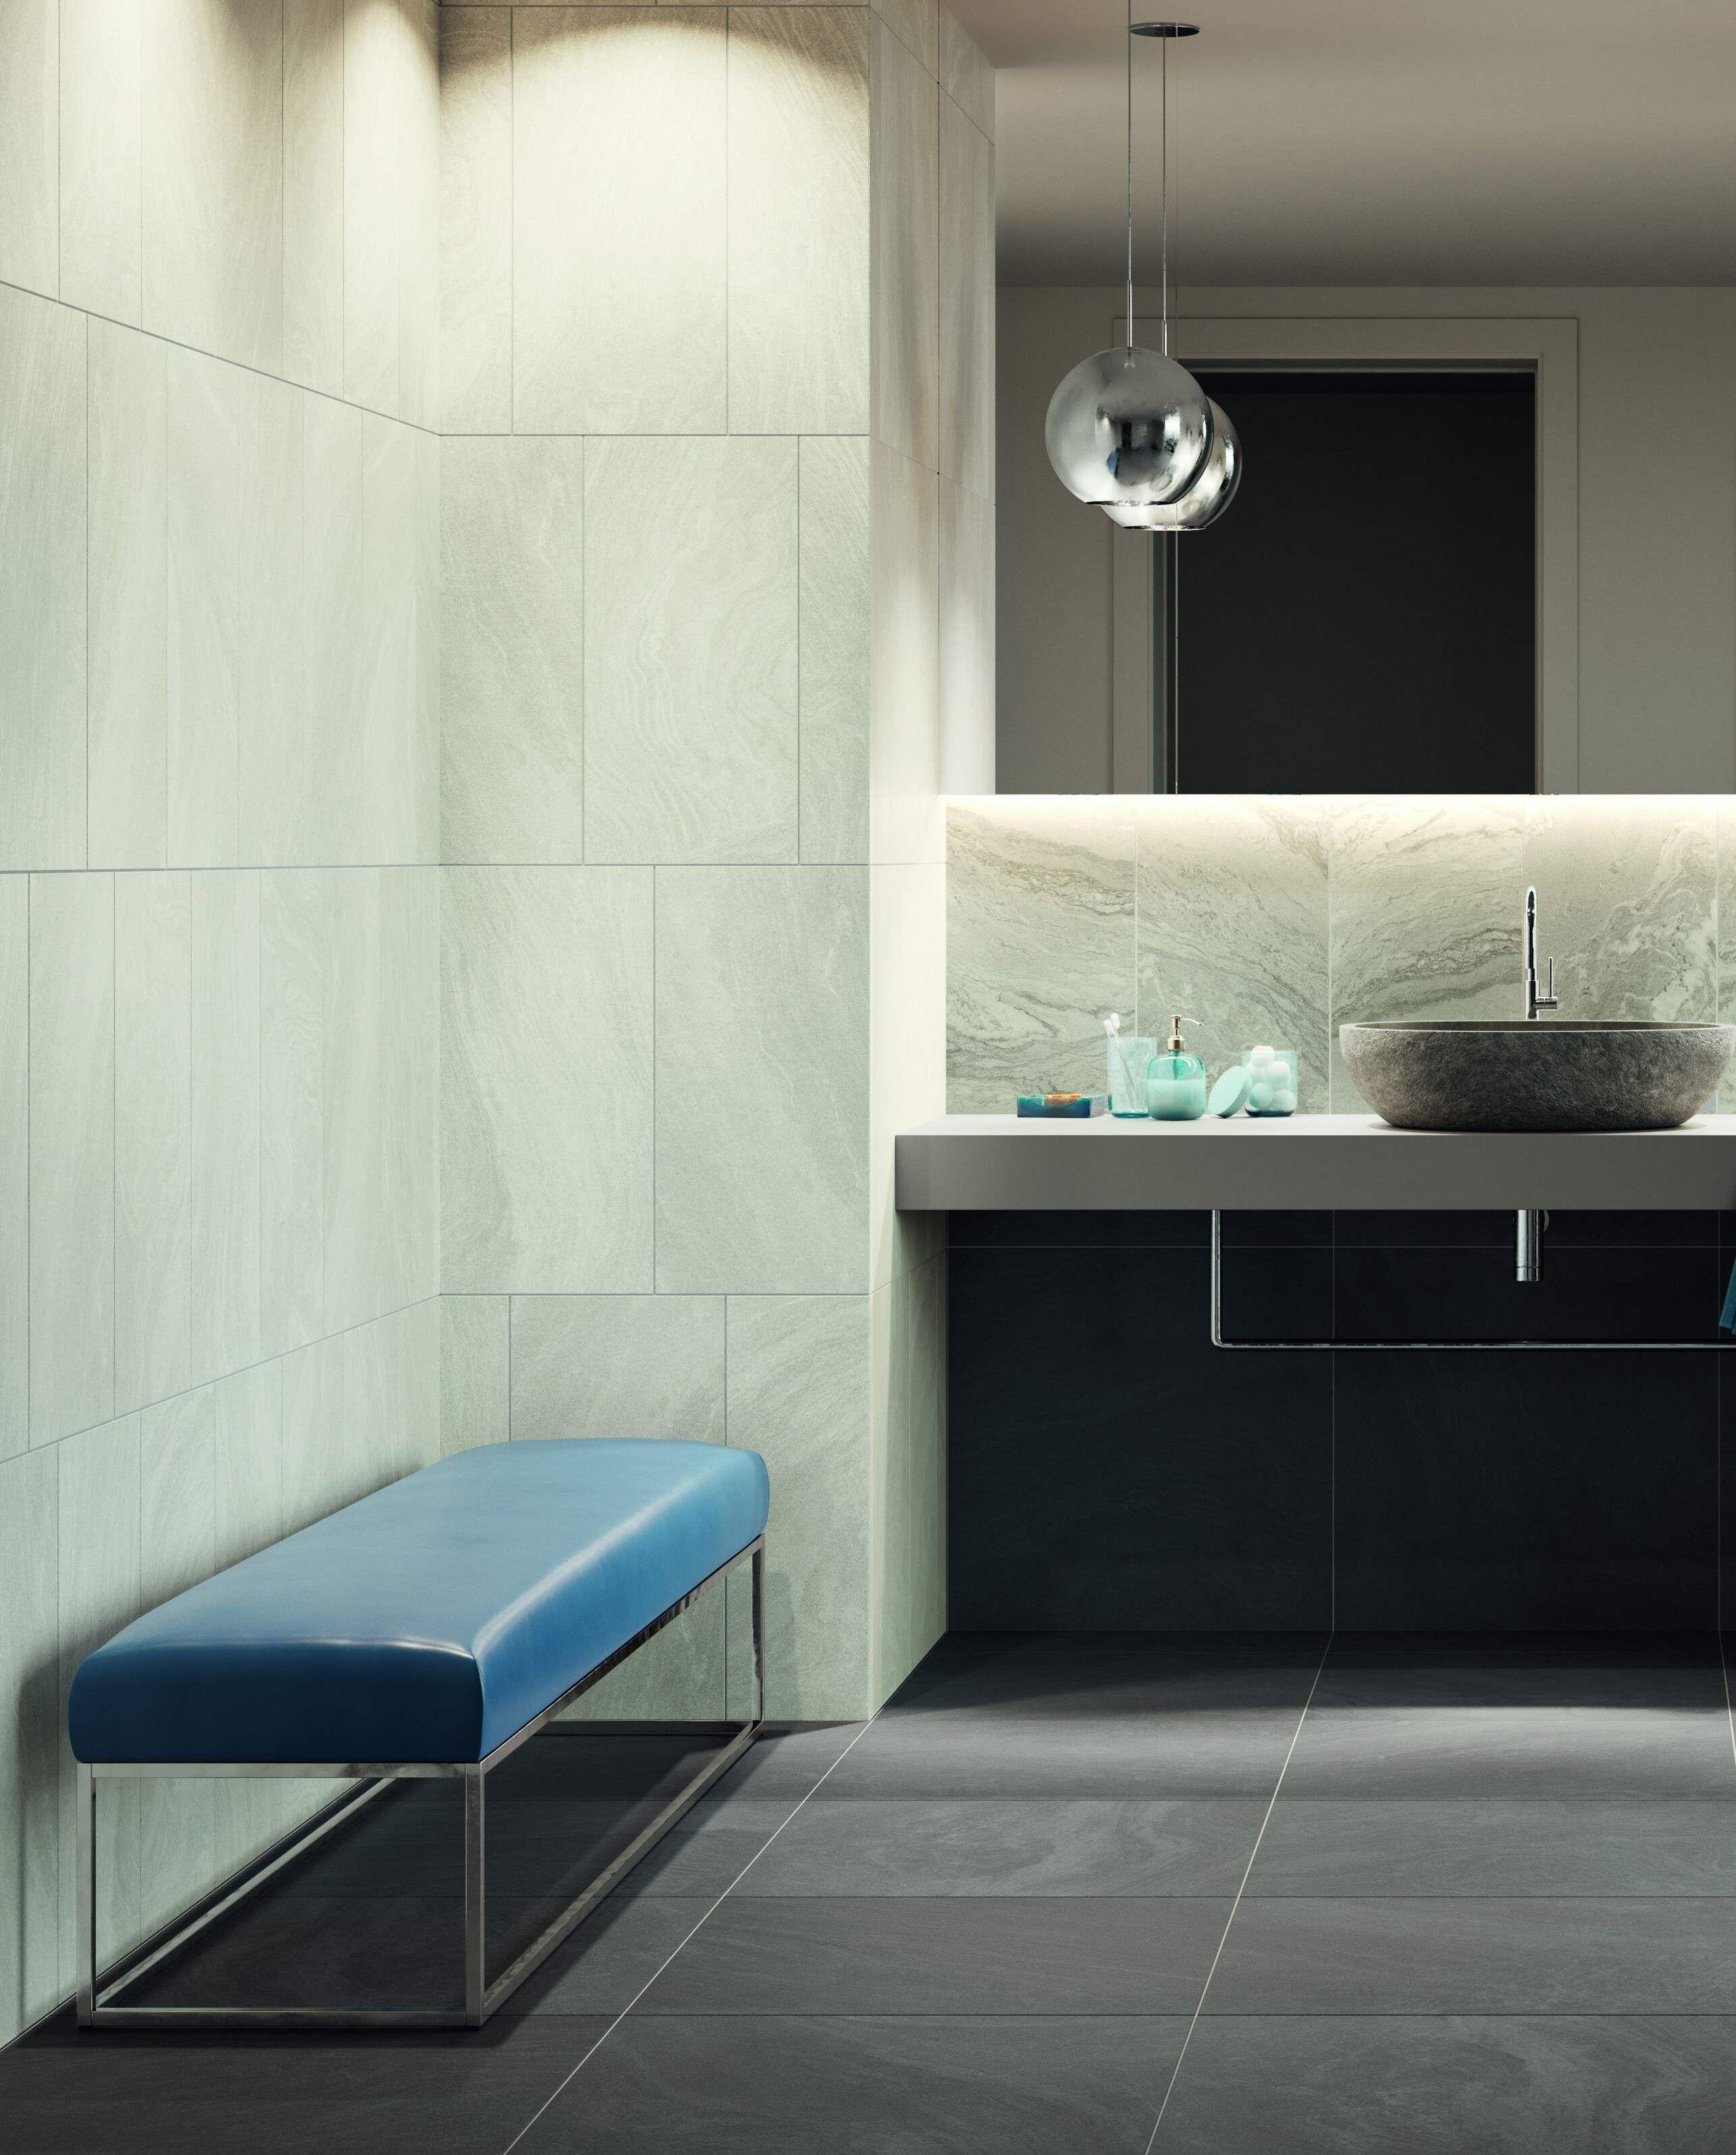 Badideen Fliesen Hochkant Verlegt Badezimmereinrichtung Badezimmerideen Fliesen